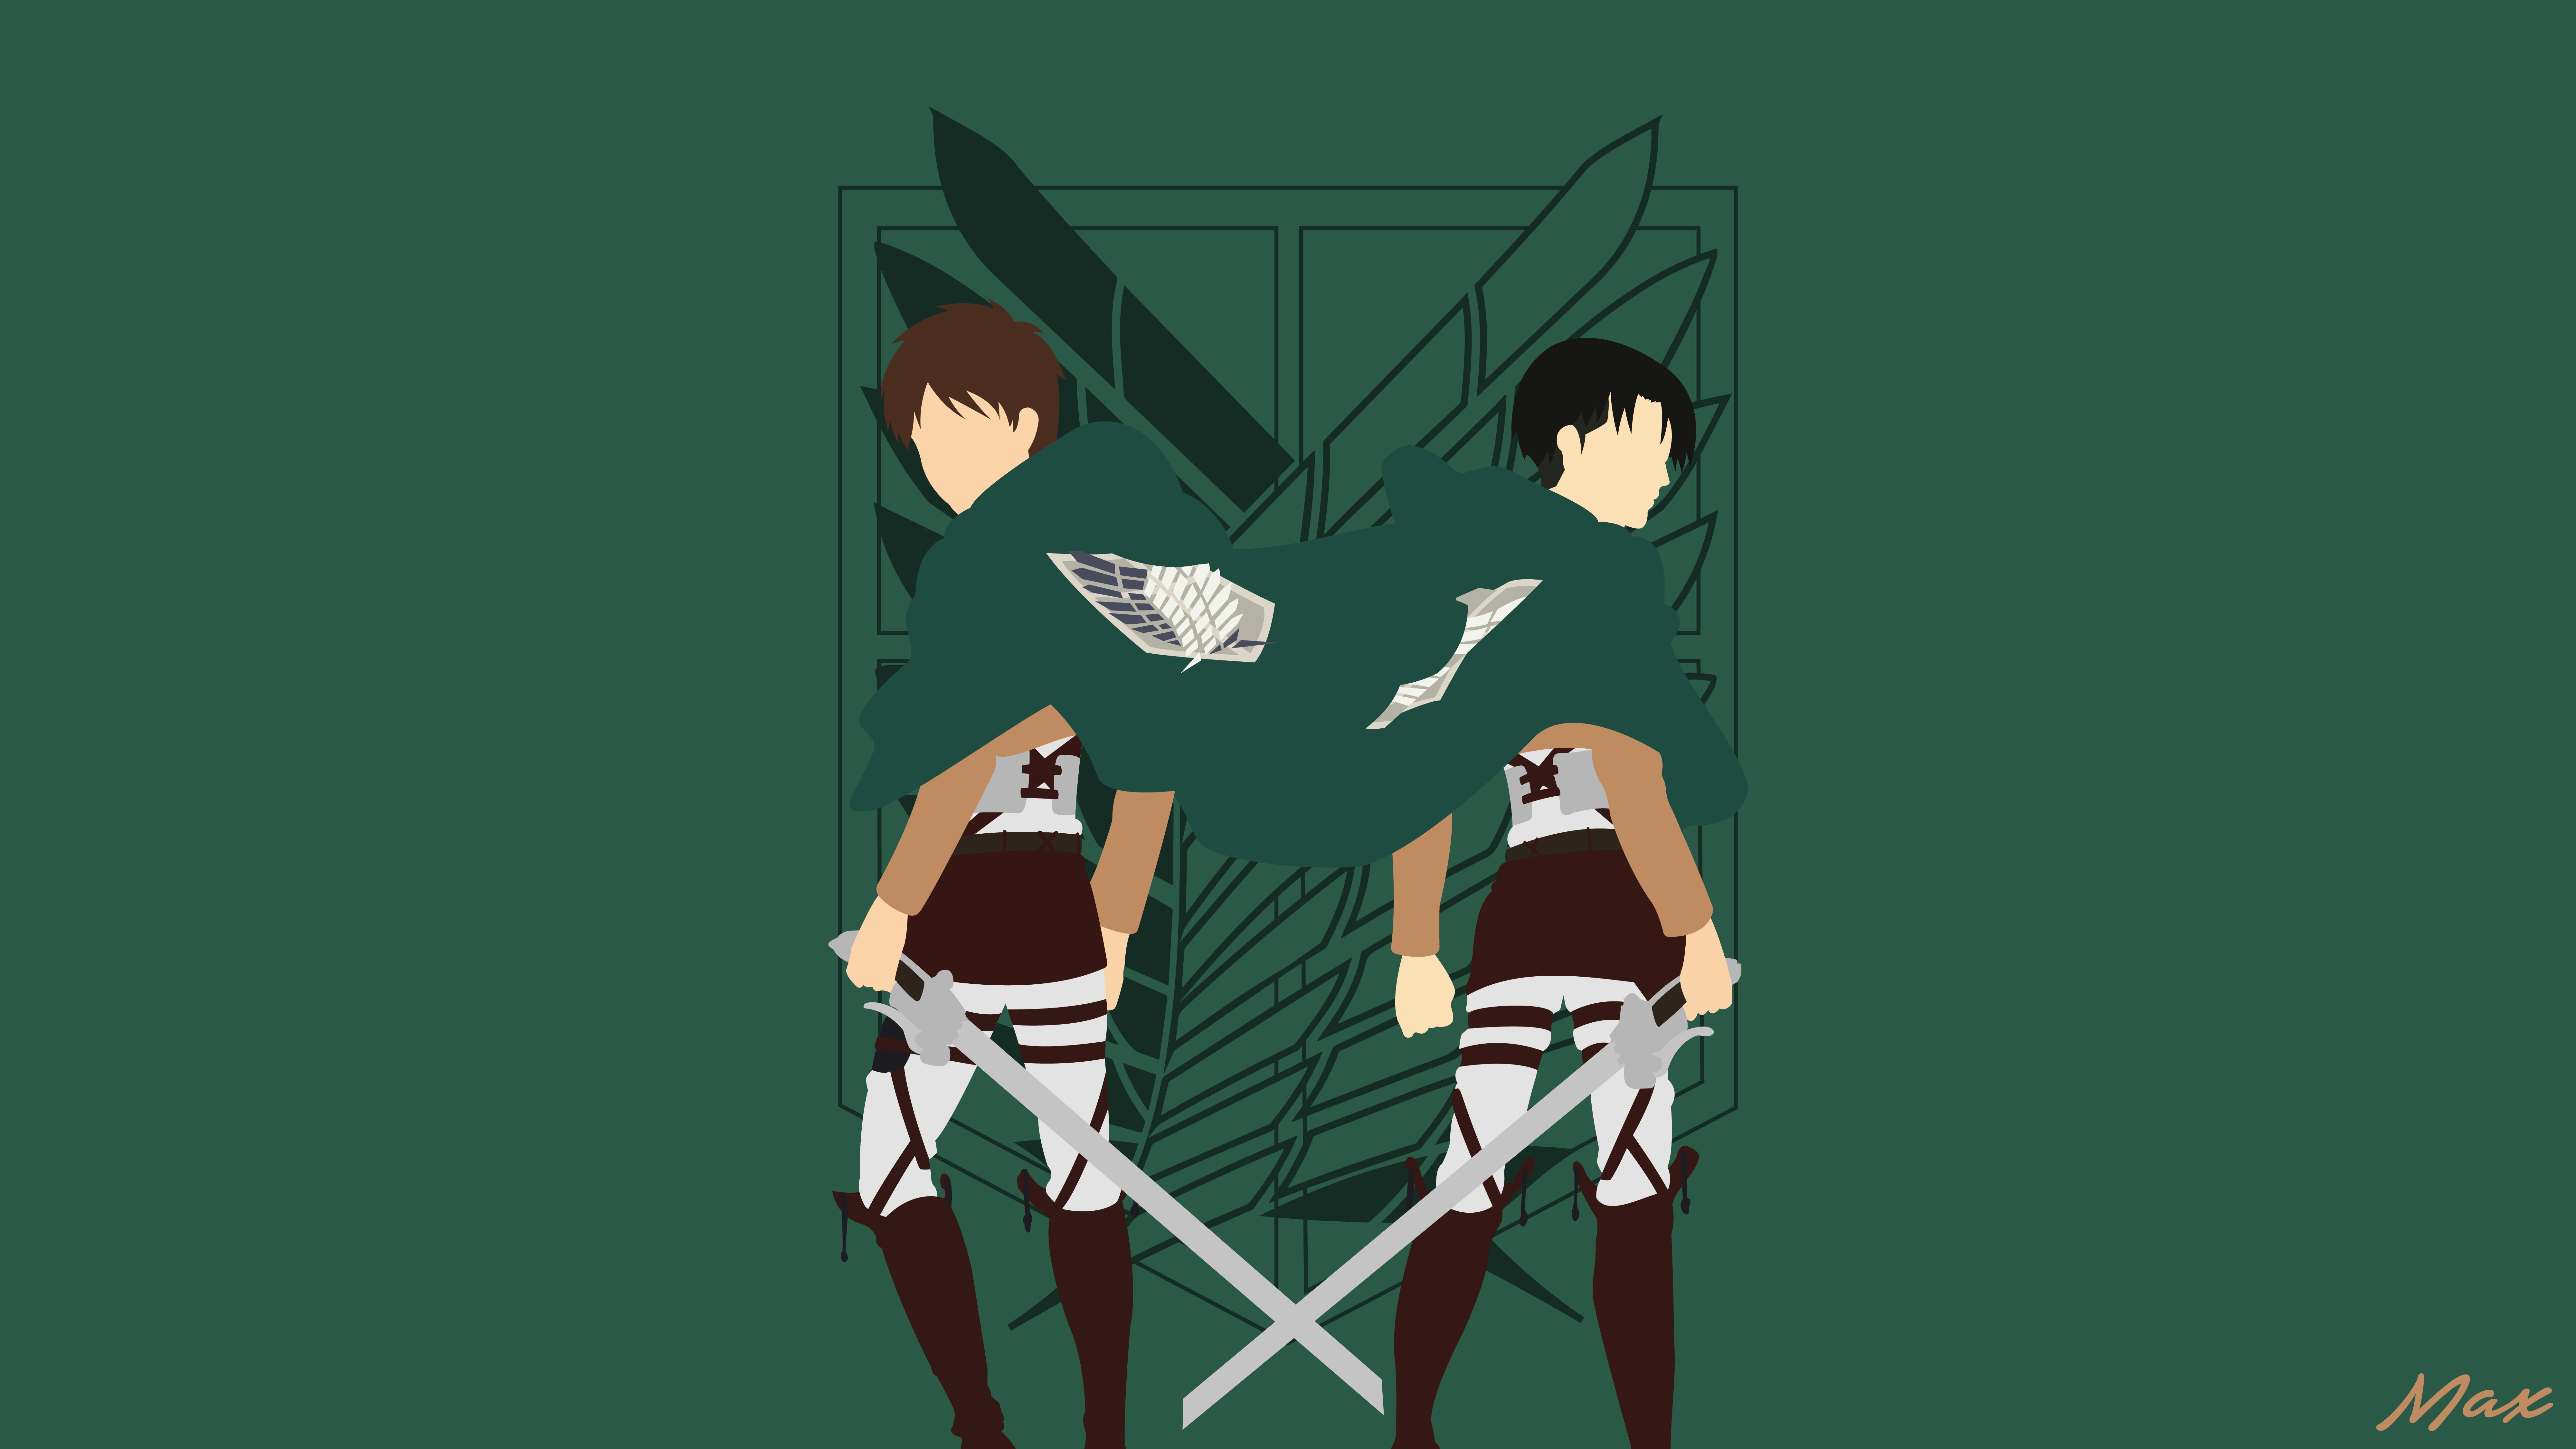 Anime Attack On Titan Eren Yeager Levi Ackerman 8k Wallpaper Hdwallpaper Desktop Attack On Titan Attack On Titan Anime Anime